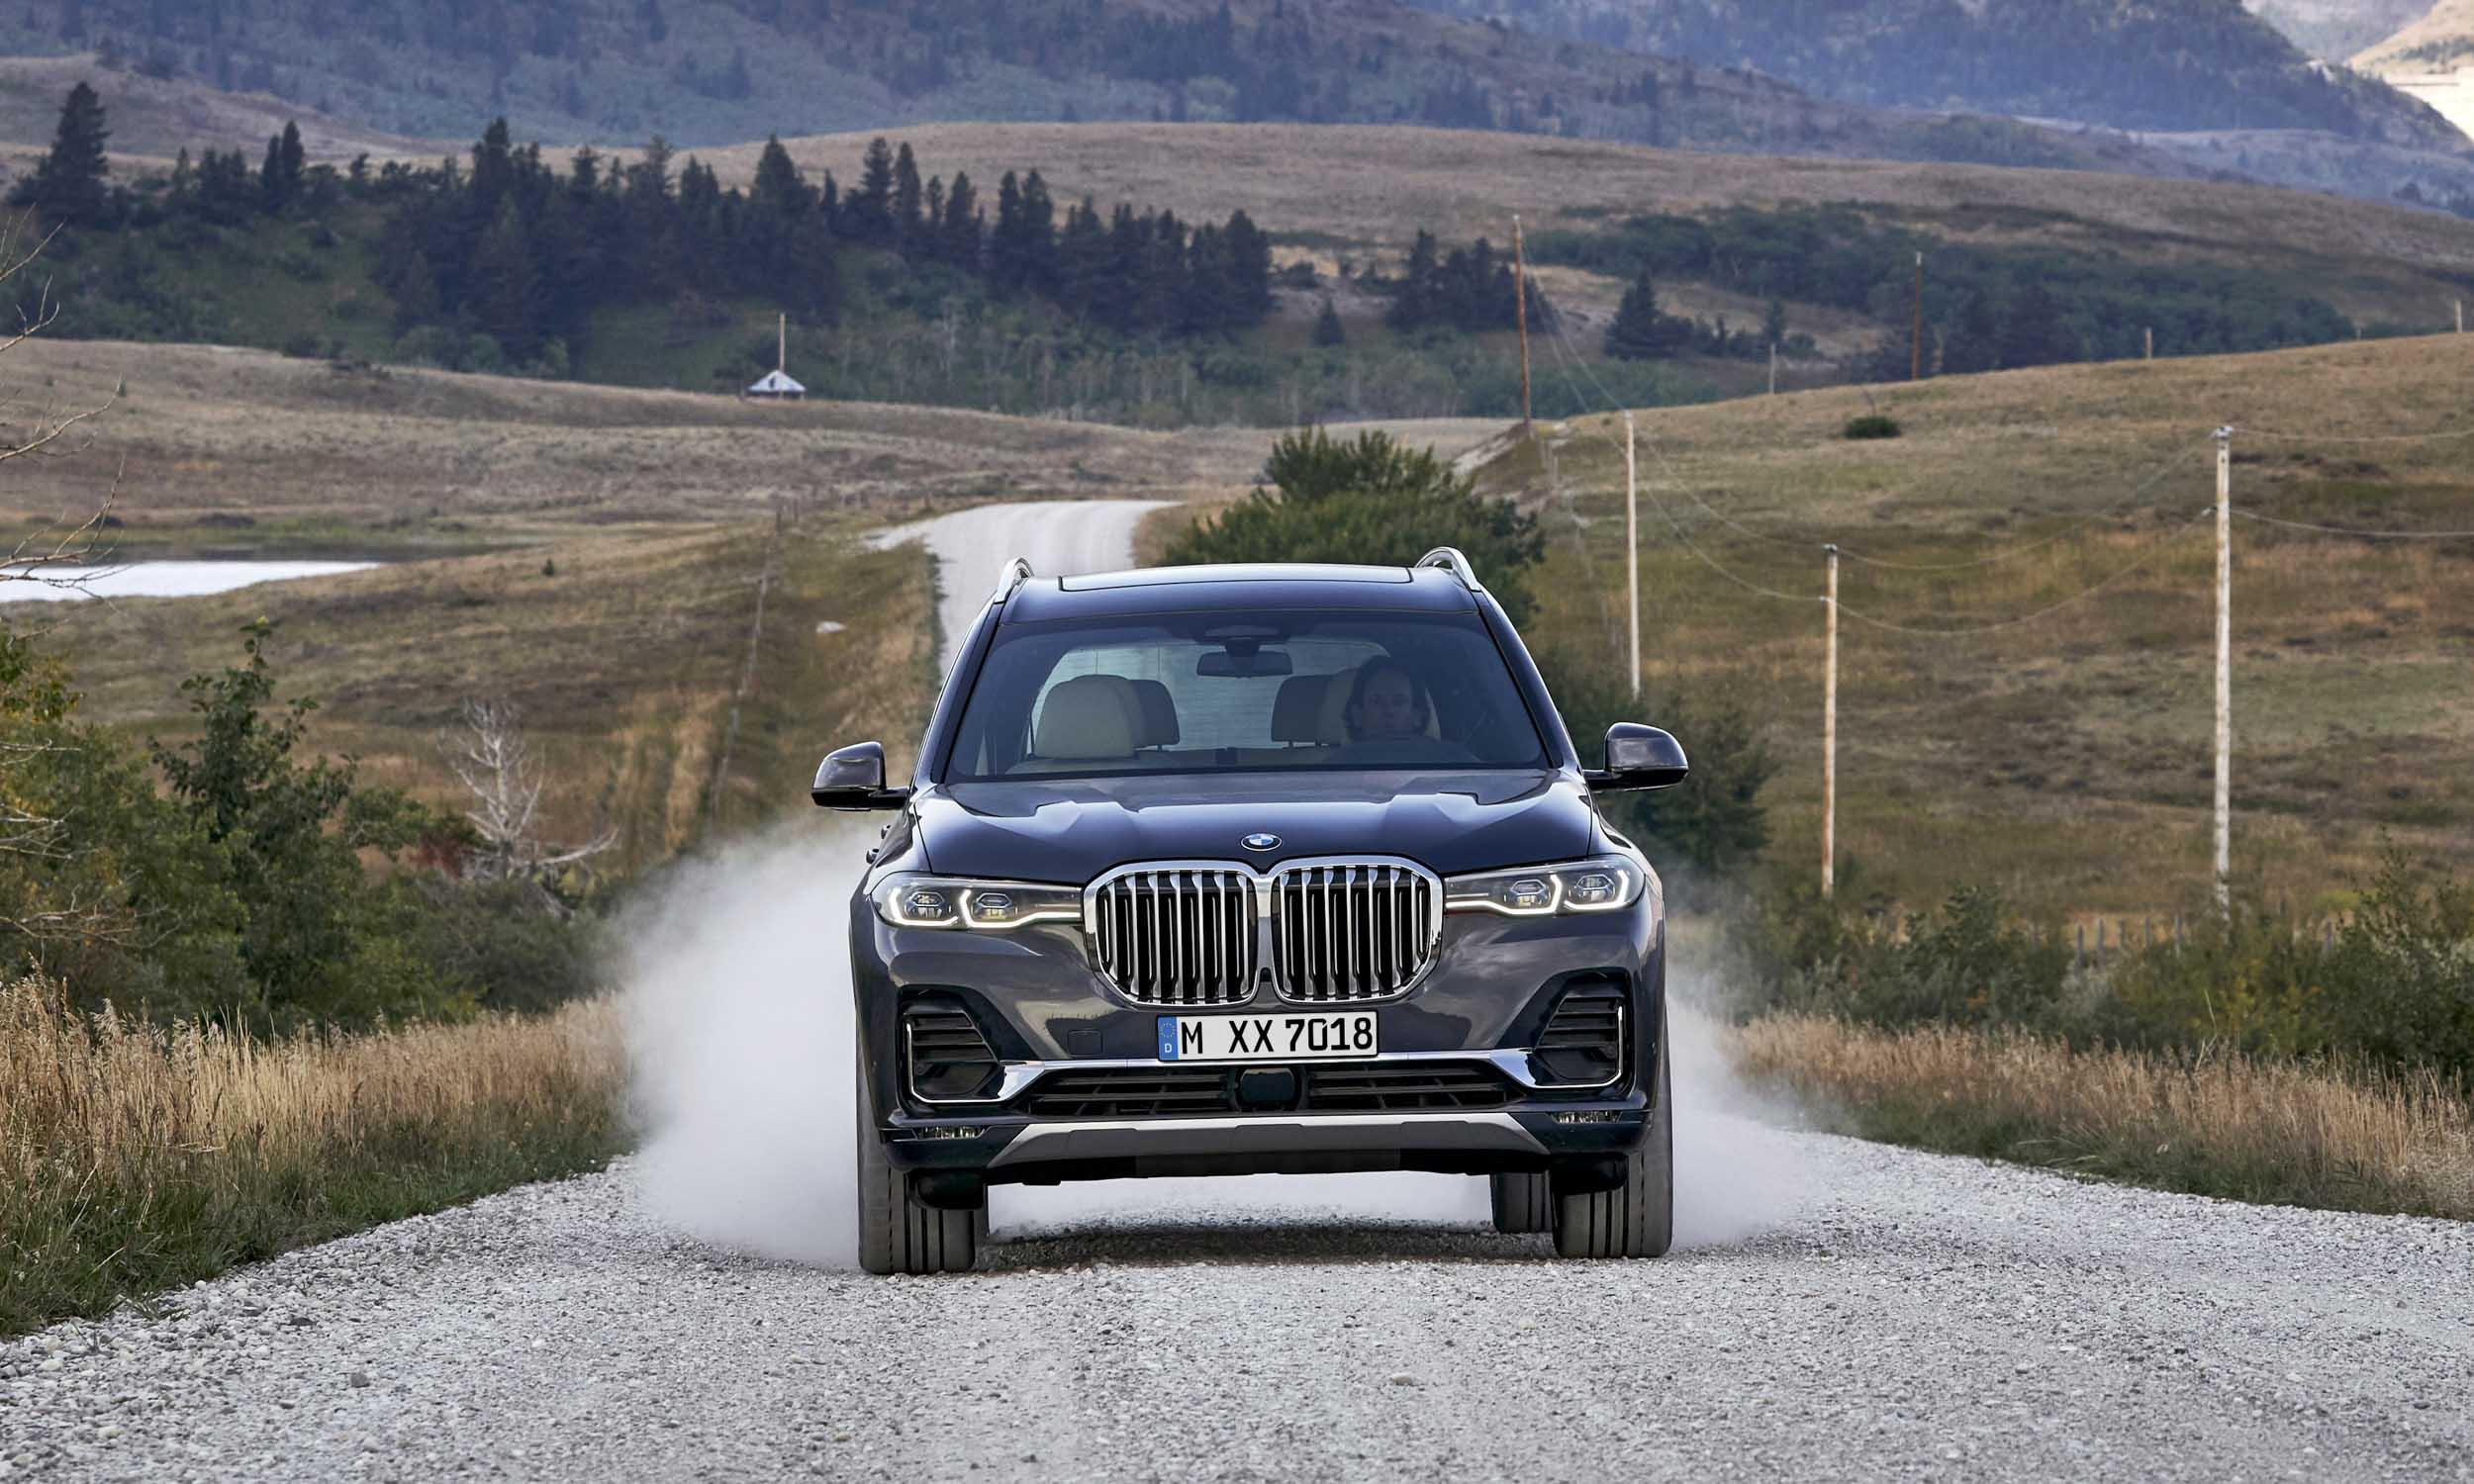 © BMW North America